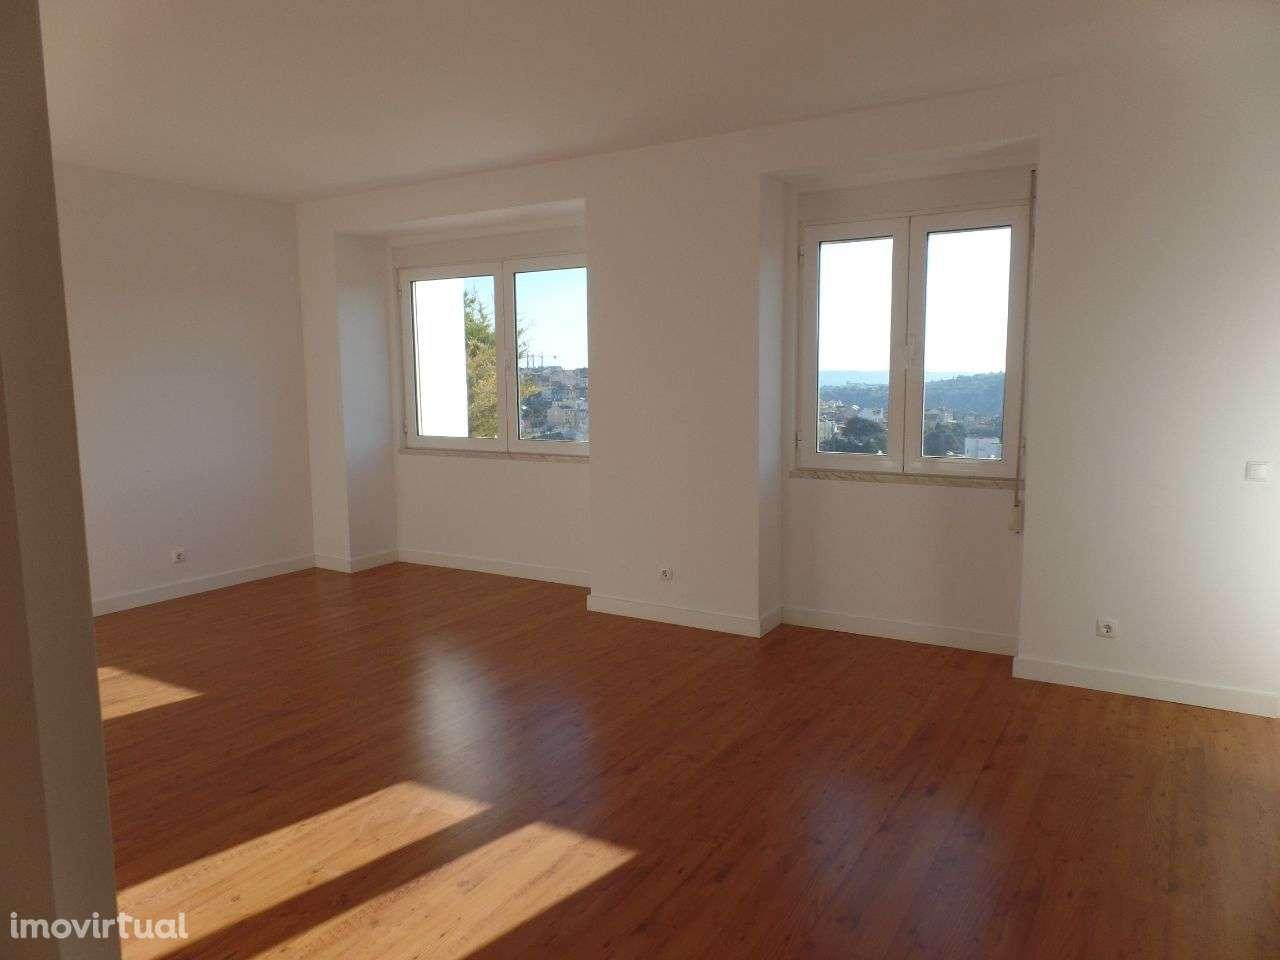 Apartamento para arrendar, Rua Francisco Rodrigues Lobo, Campolide - Foto 1